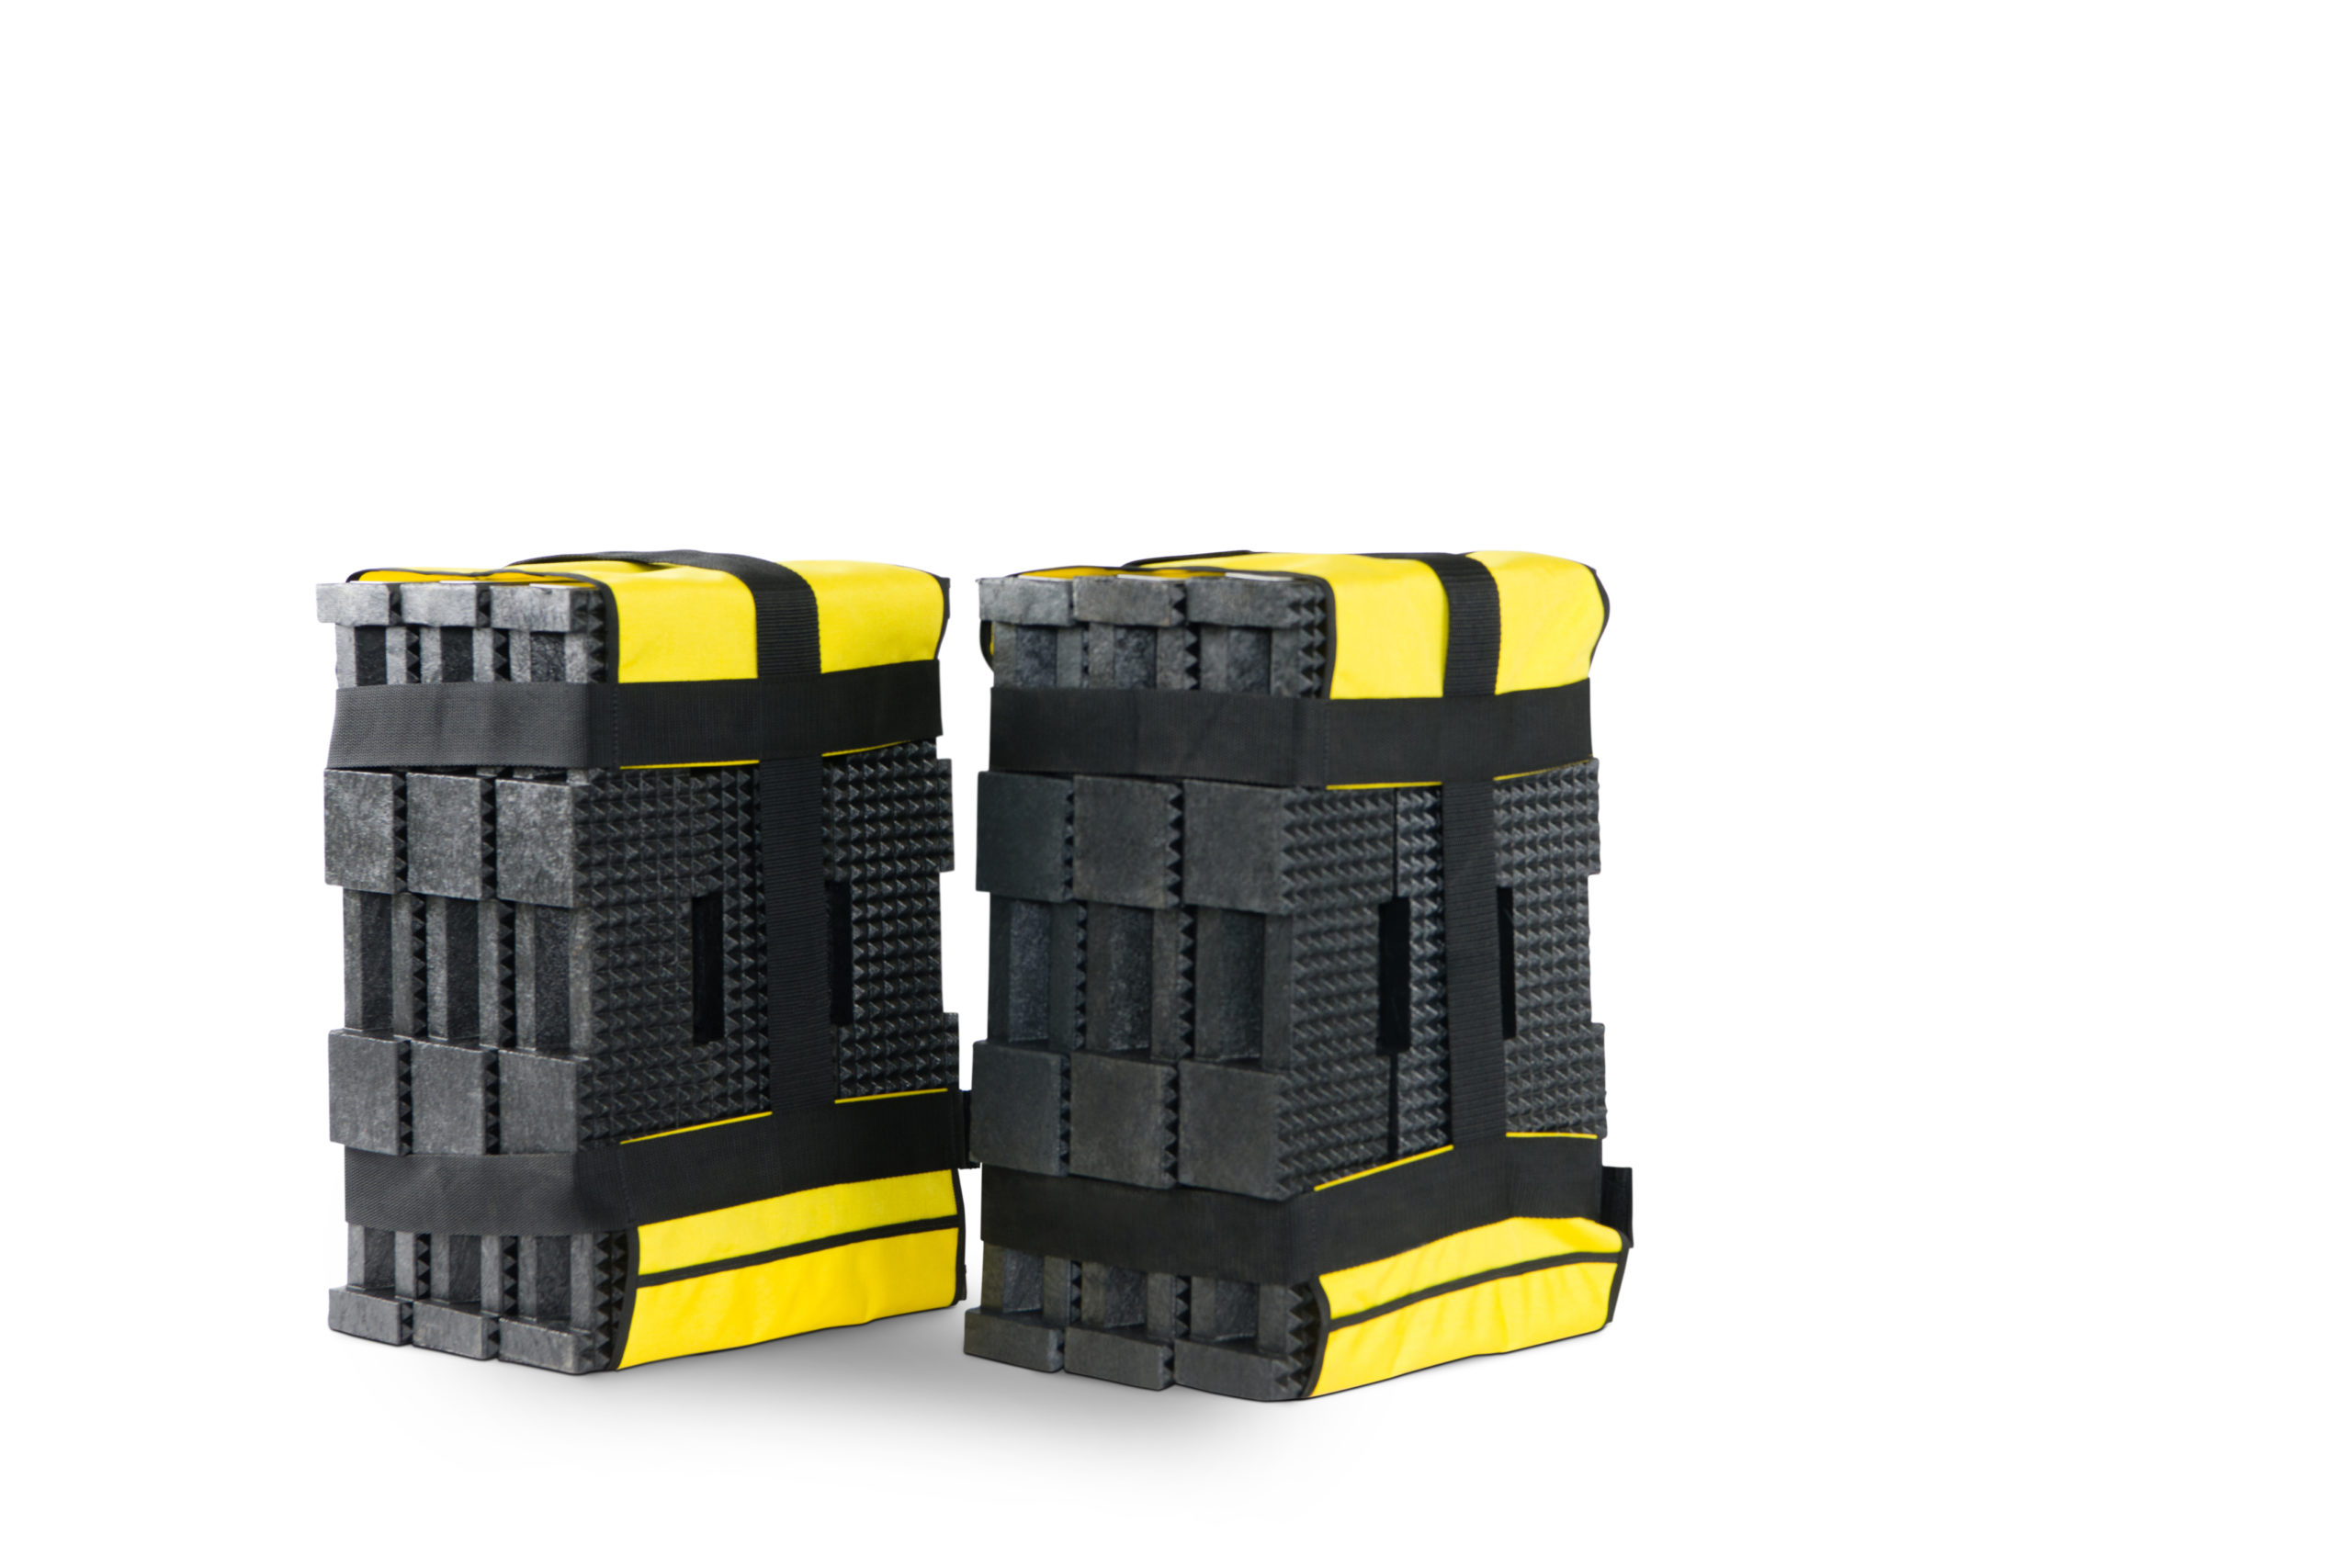 Crib Toter Hybrid Kit™